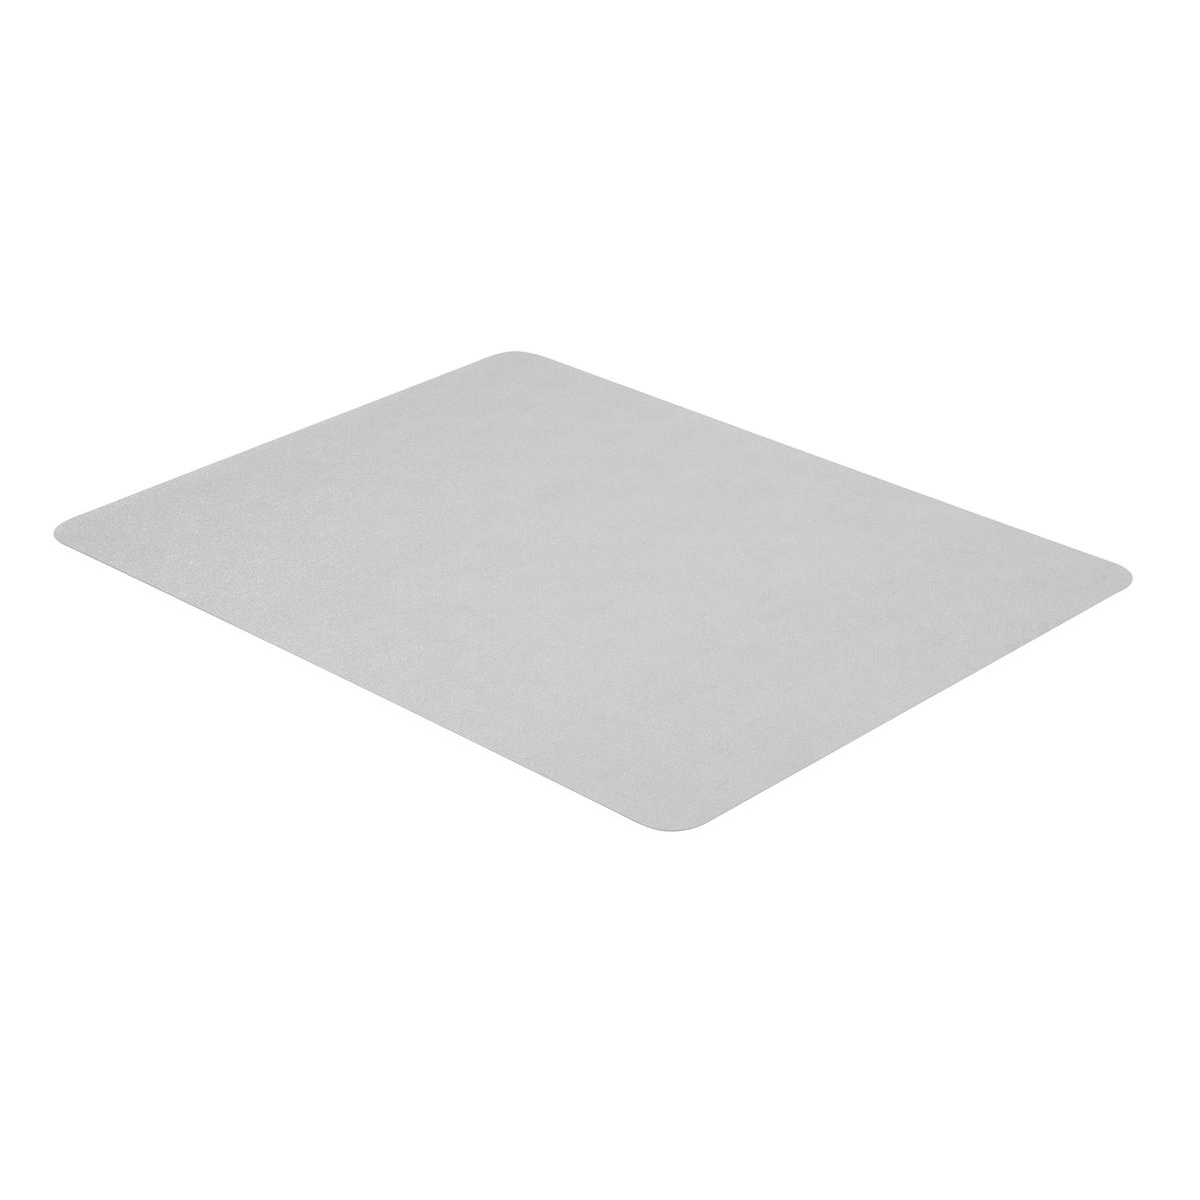 Cleartex Valuemat Chair Mat PVC Rectangular For Carpets 1200x750mm Clear Ref FC1175120EV